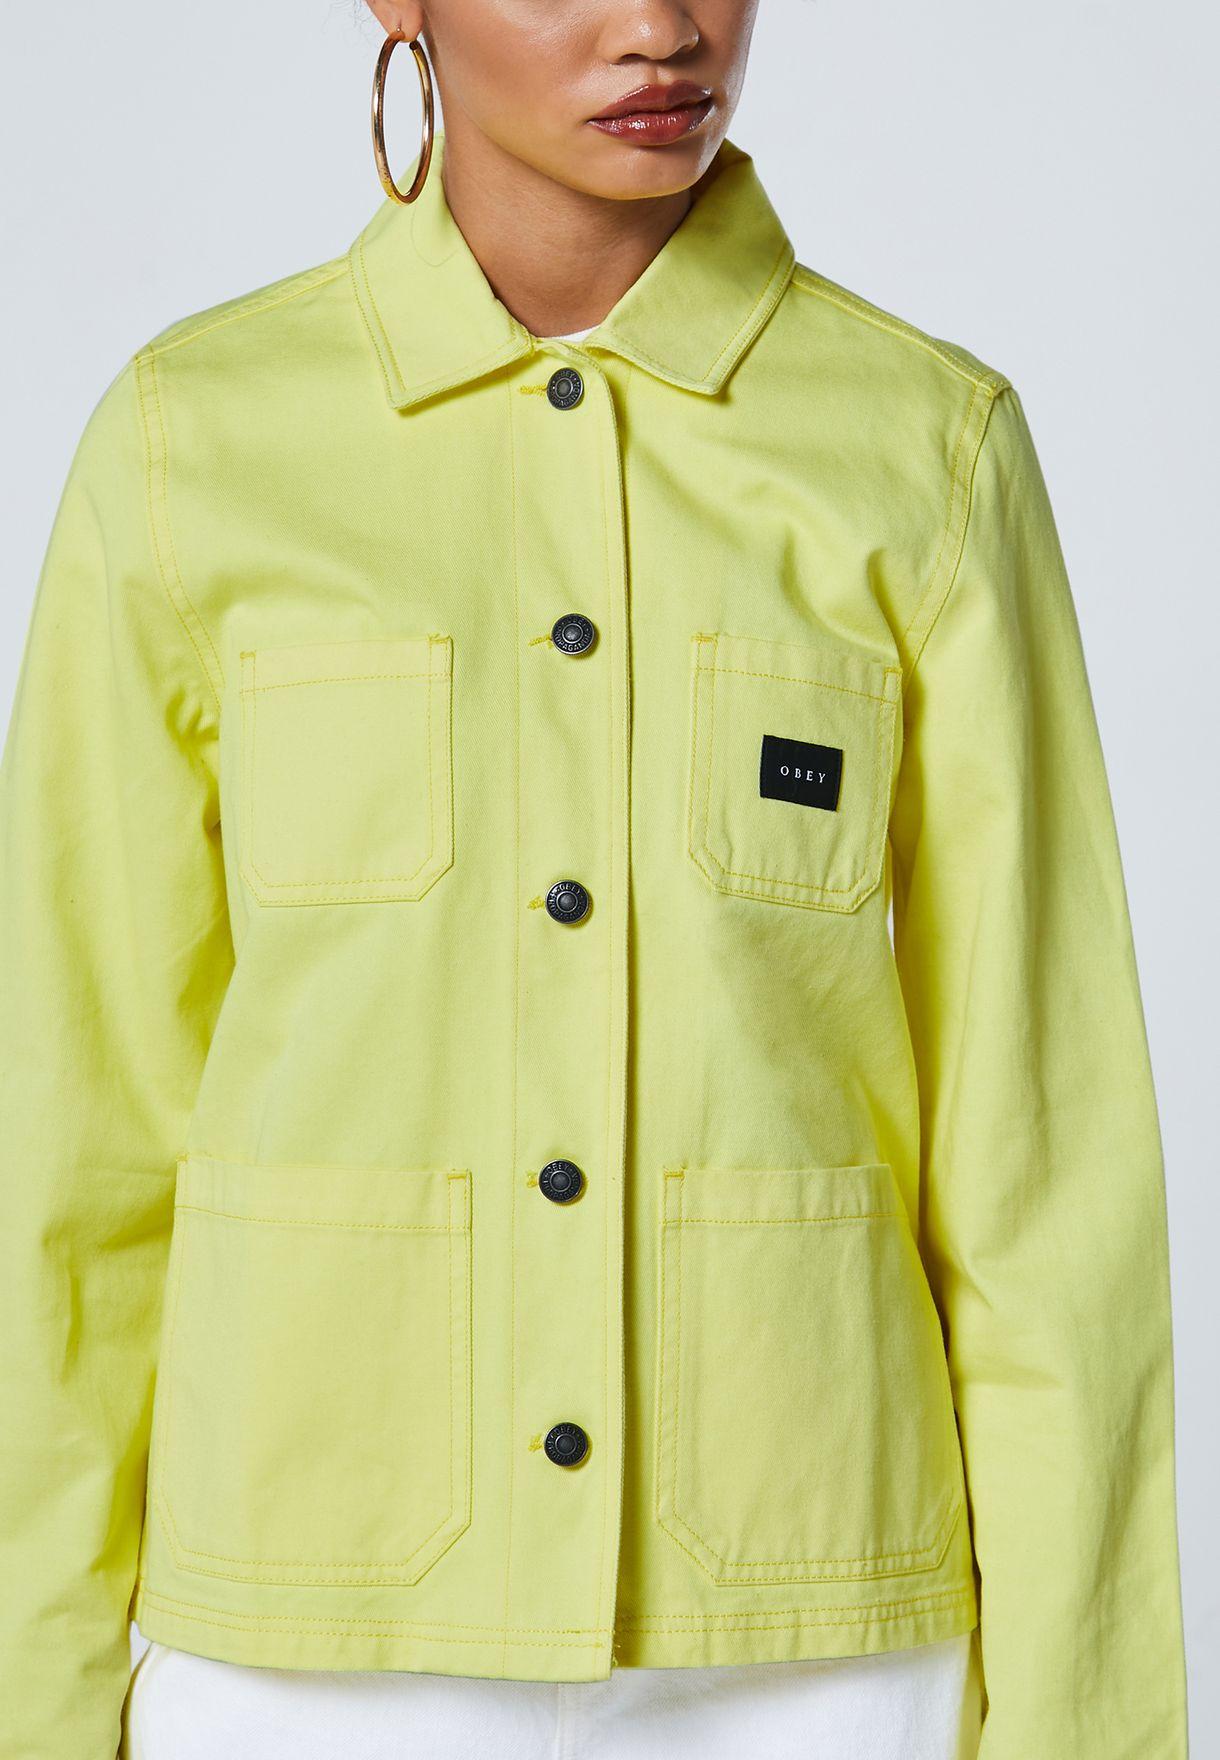 Slacker Chore Jacket